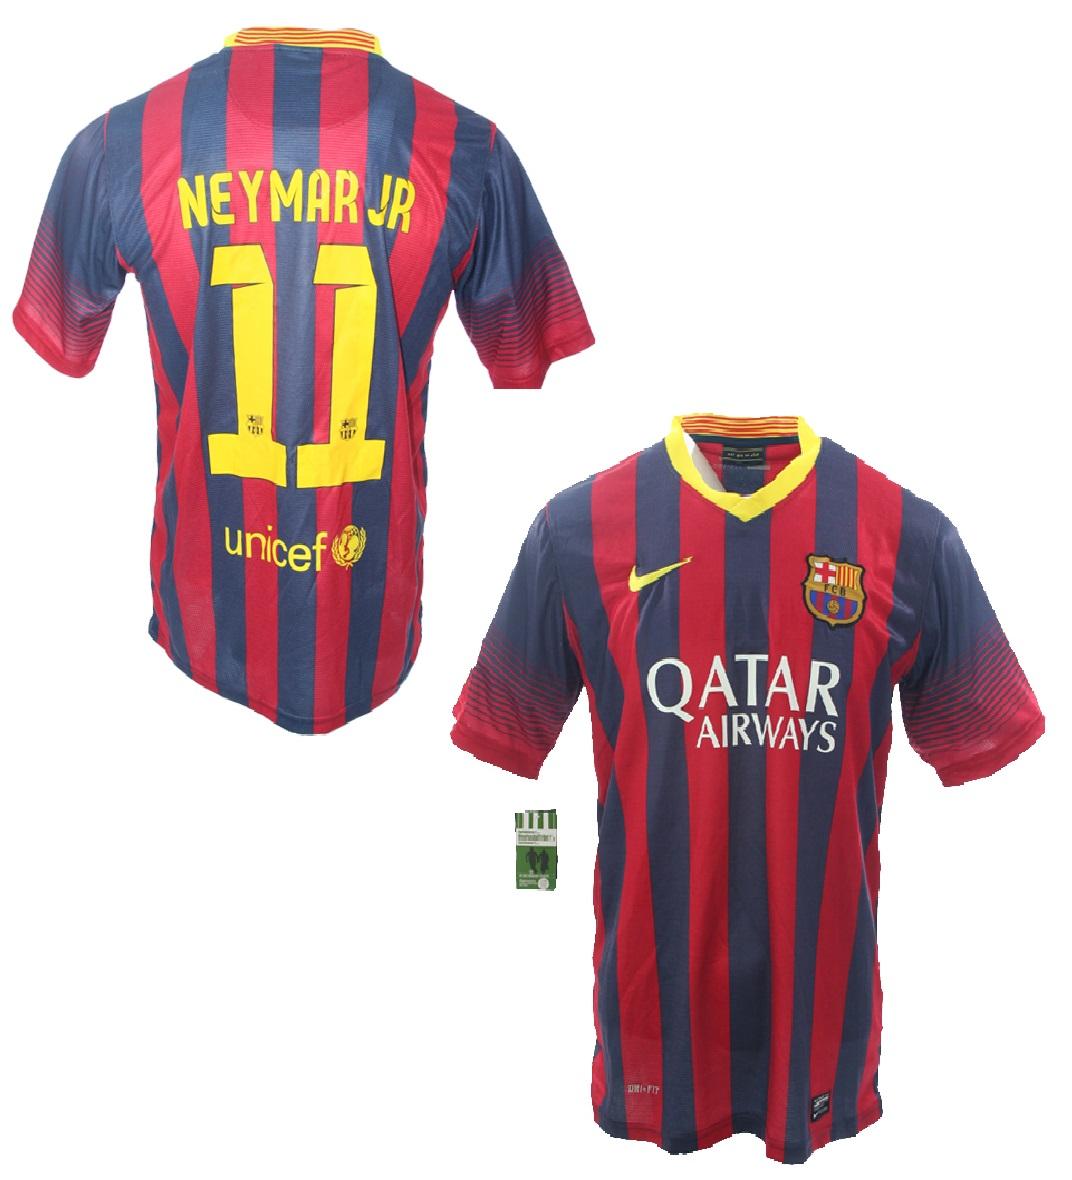 Nike FC Barcelona Jersey 11 Neyma 2013 14 Qatar home men